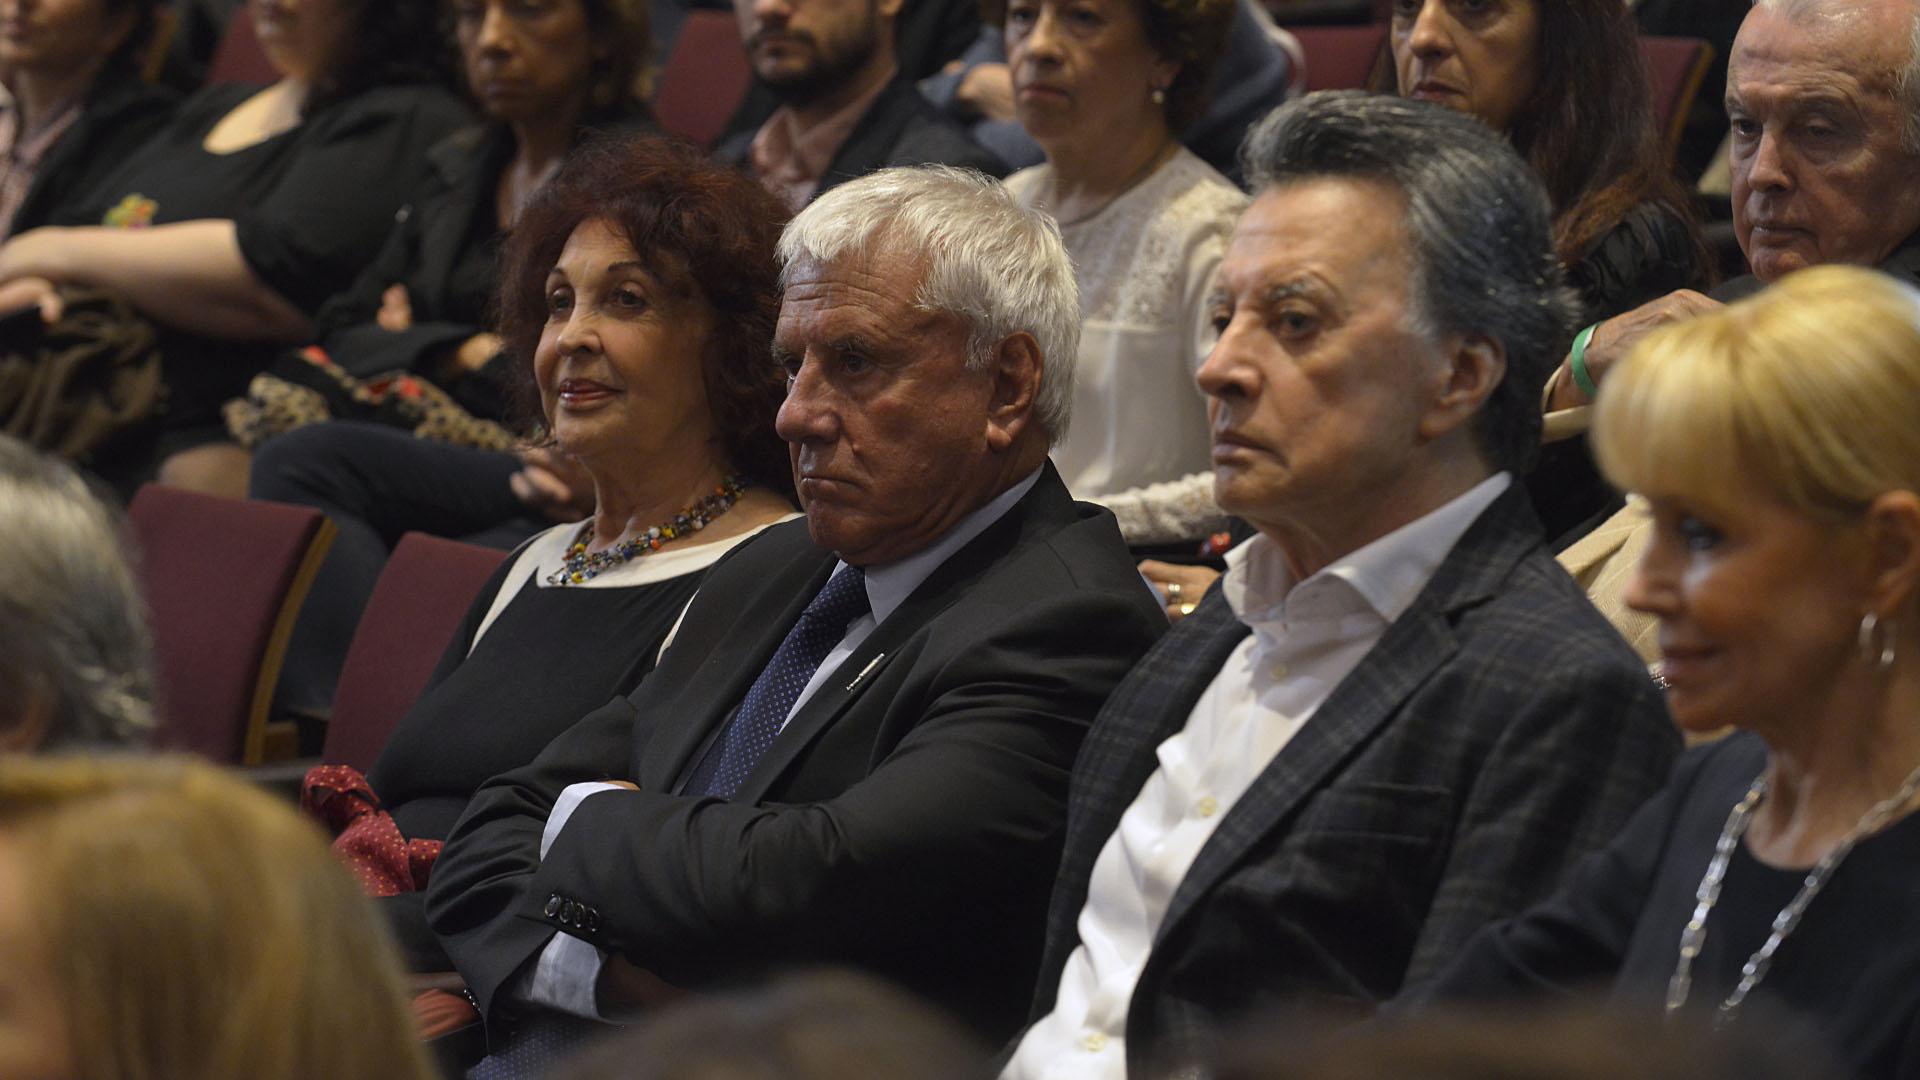 Gabriela Acher, Fernado Bravo, Palito Ortega y Evangelina Salazar